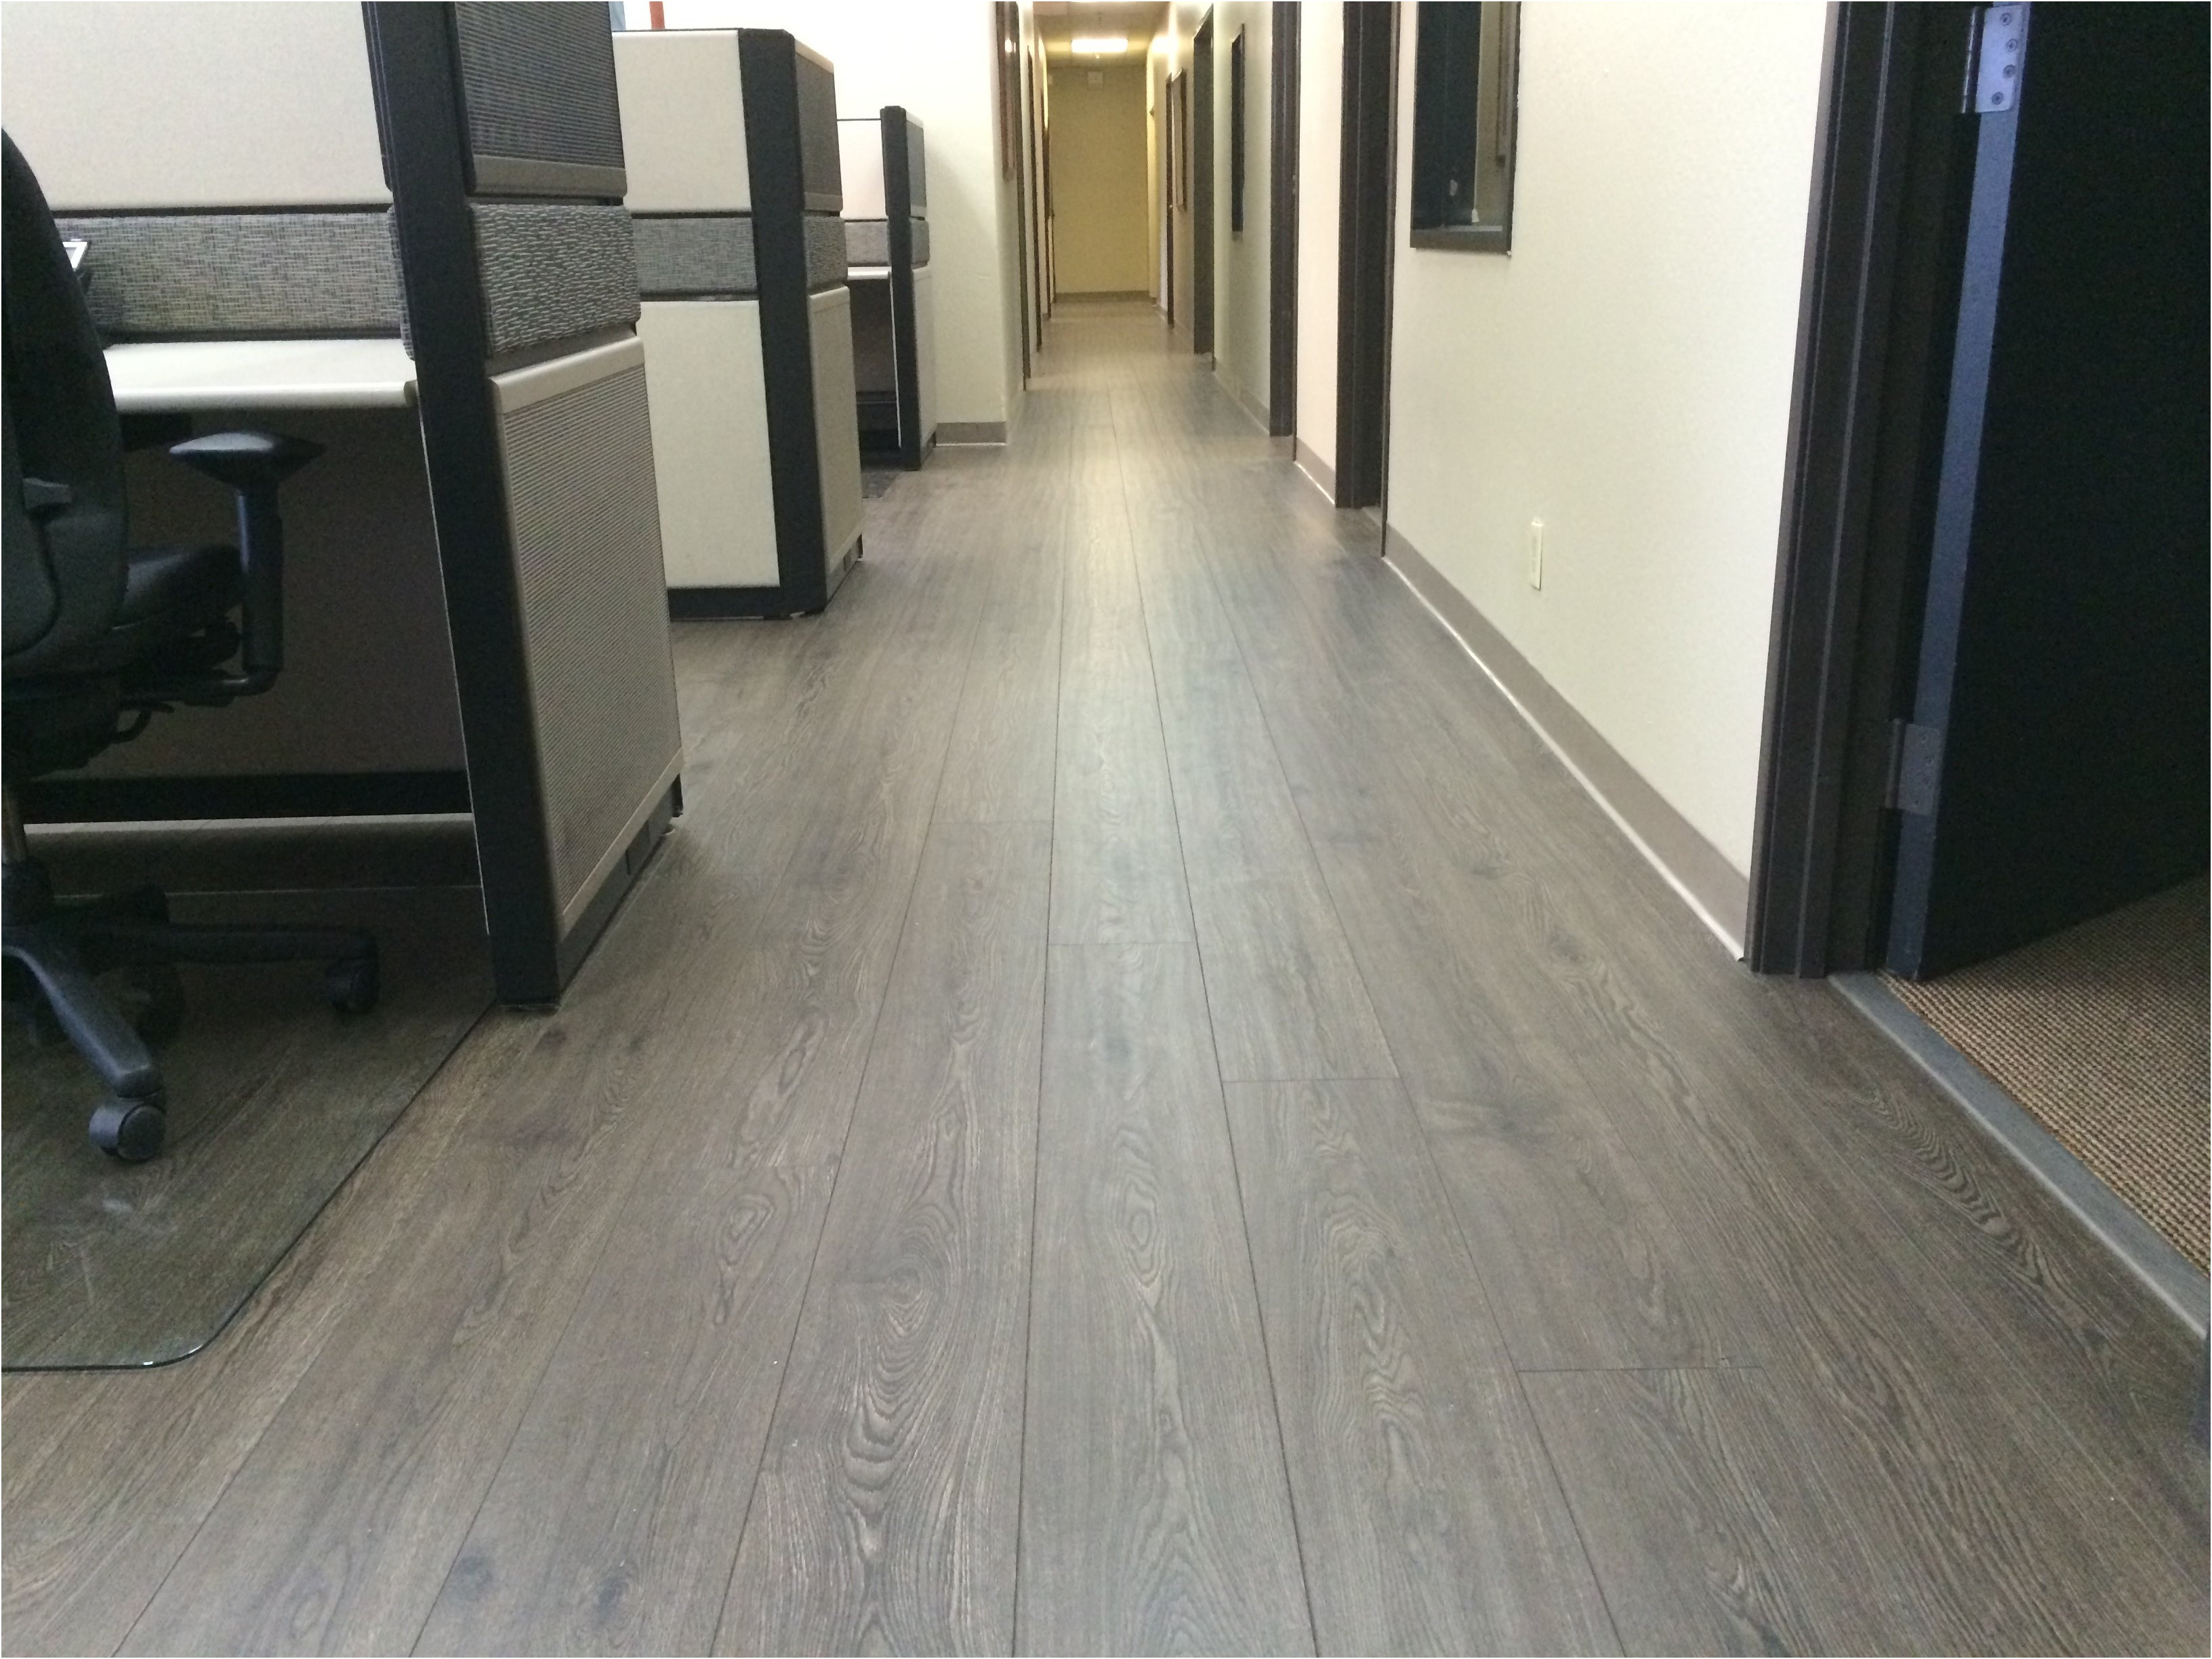 hardwood floor underlayment home depot of wood laminate flooring vs hardwood lovely engineered hardwood in related post